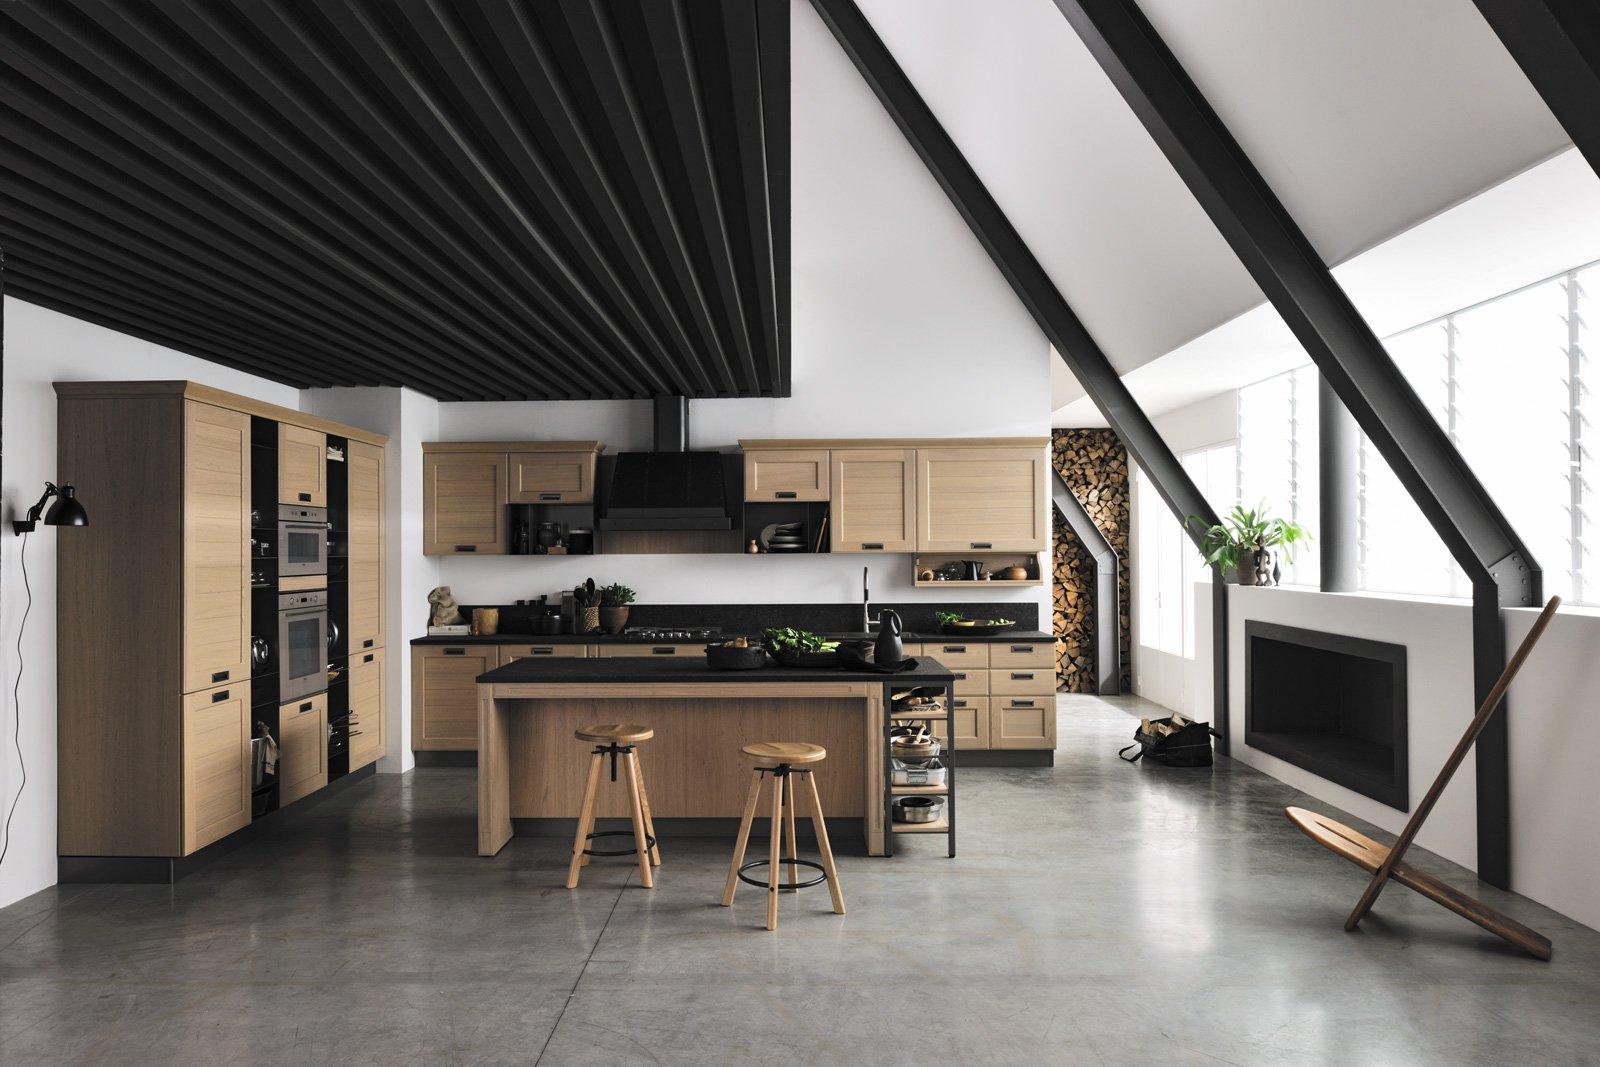 Cucina Rovere Chiaro Sistema 901 : Superfici materiche in cucina cose di casa